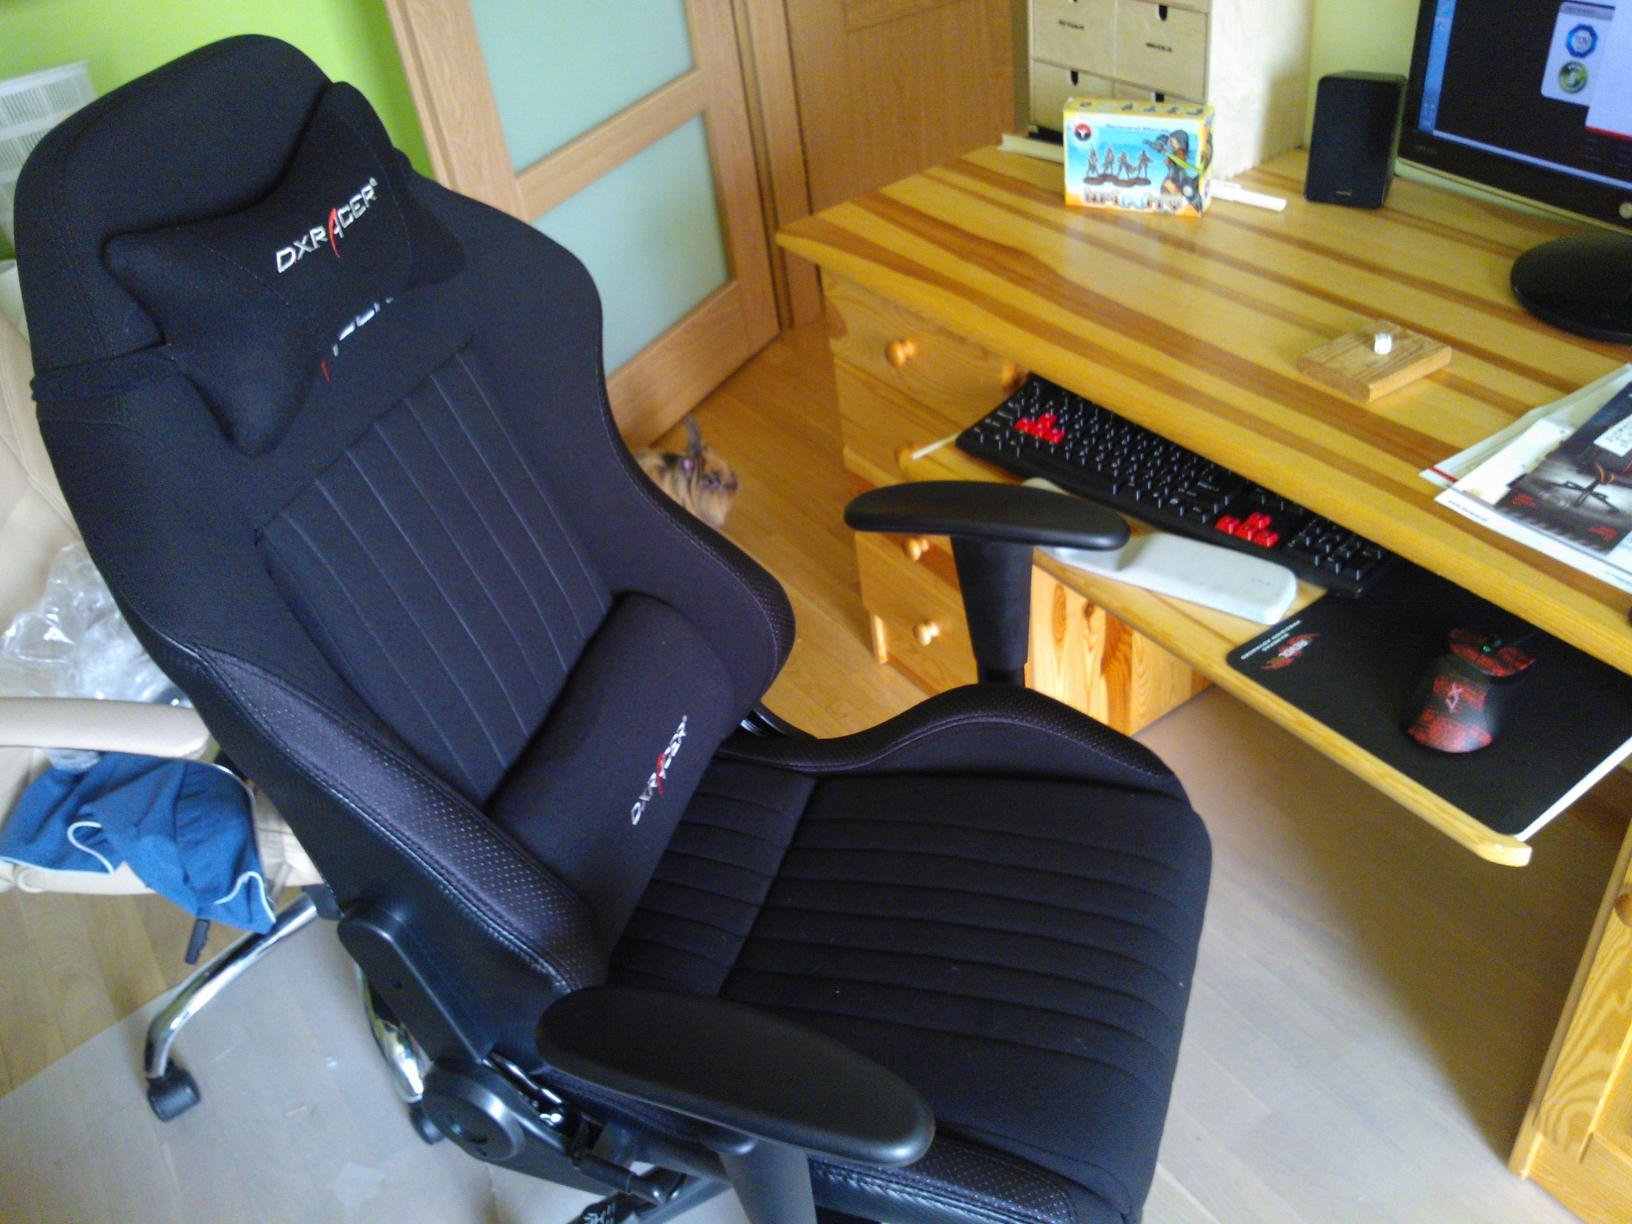 Ultimate computer chair  DXRacer  Nihil novi sub sole